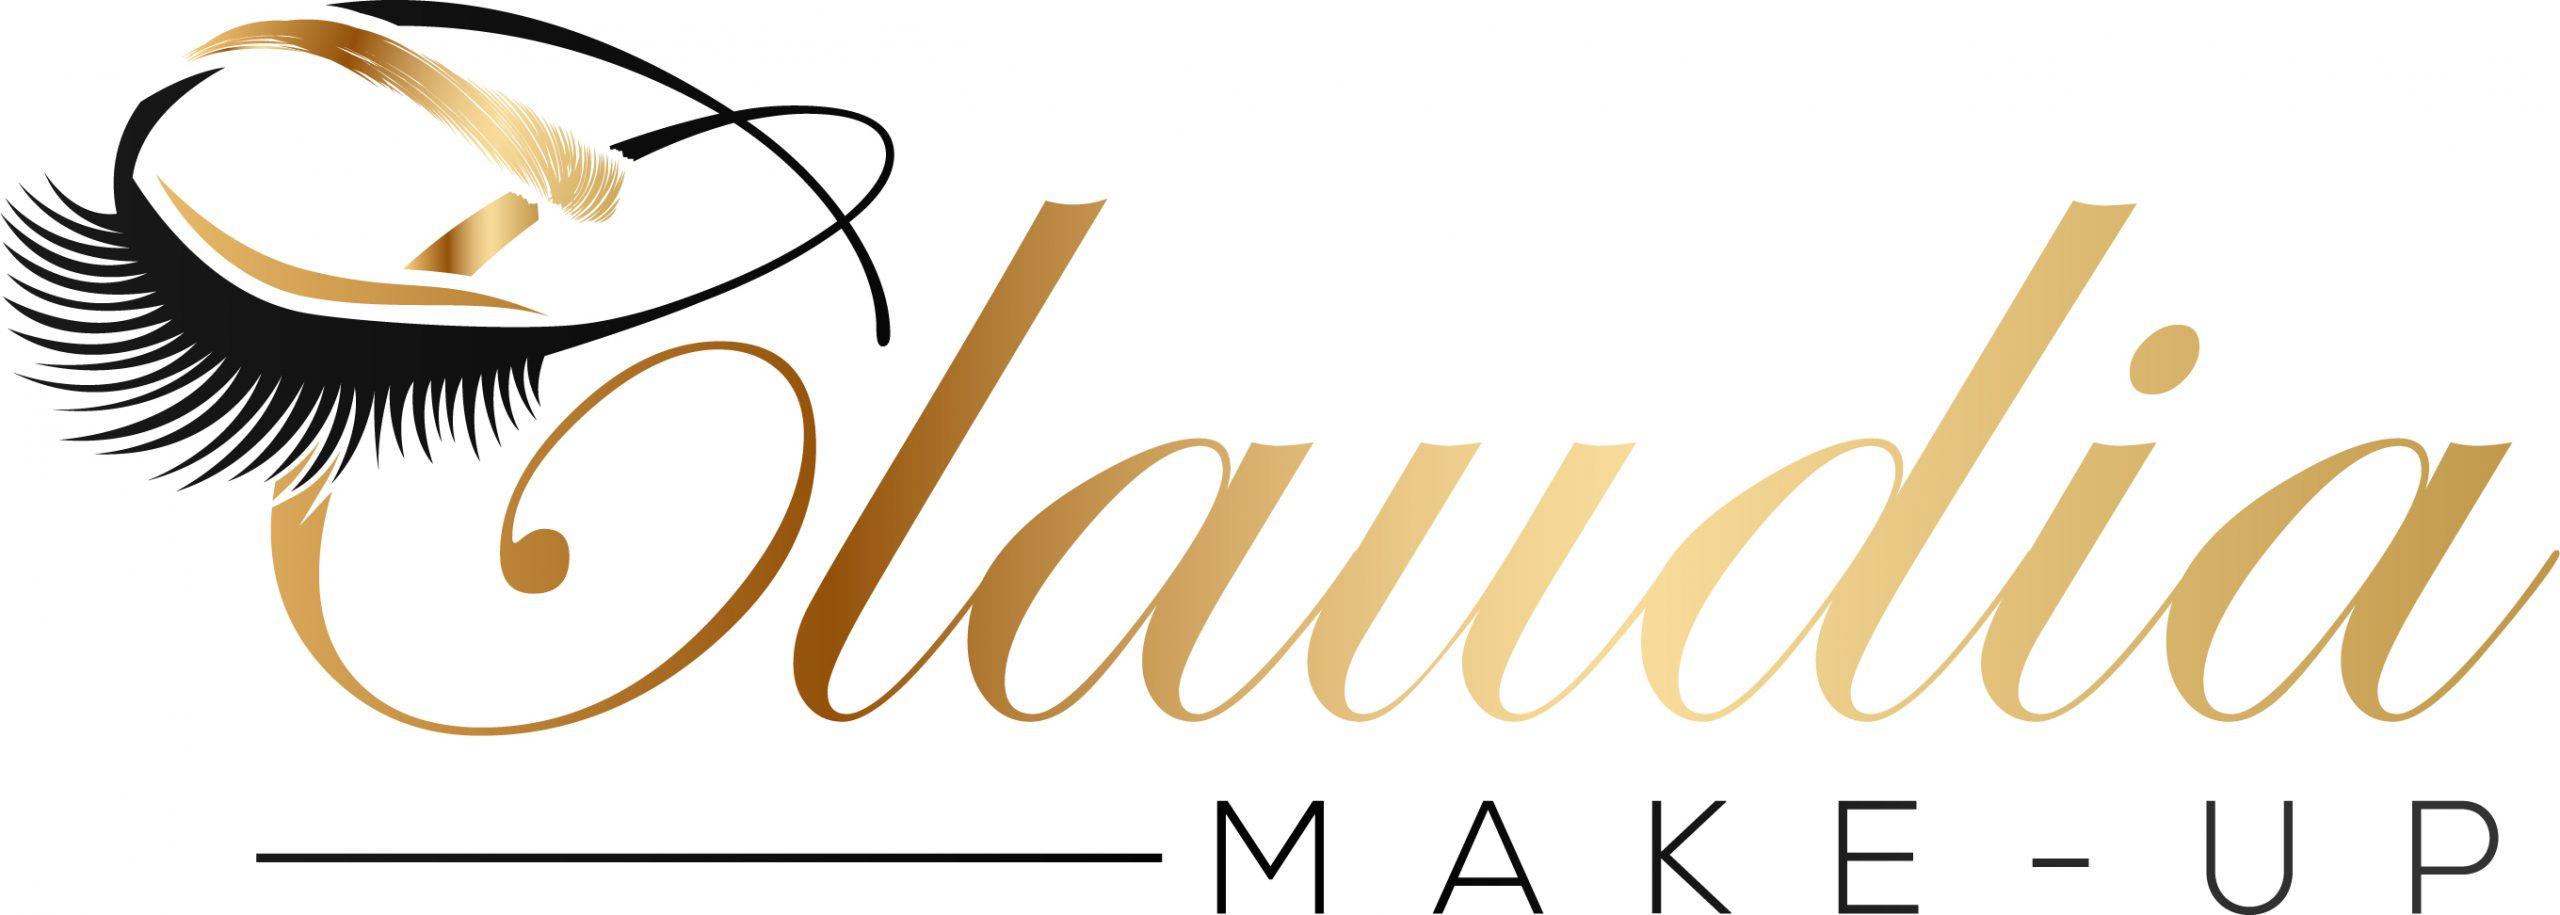 Claudia make-up